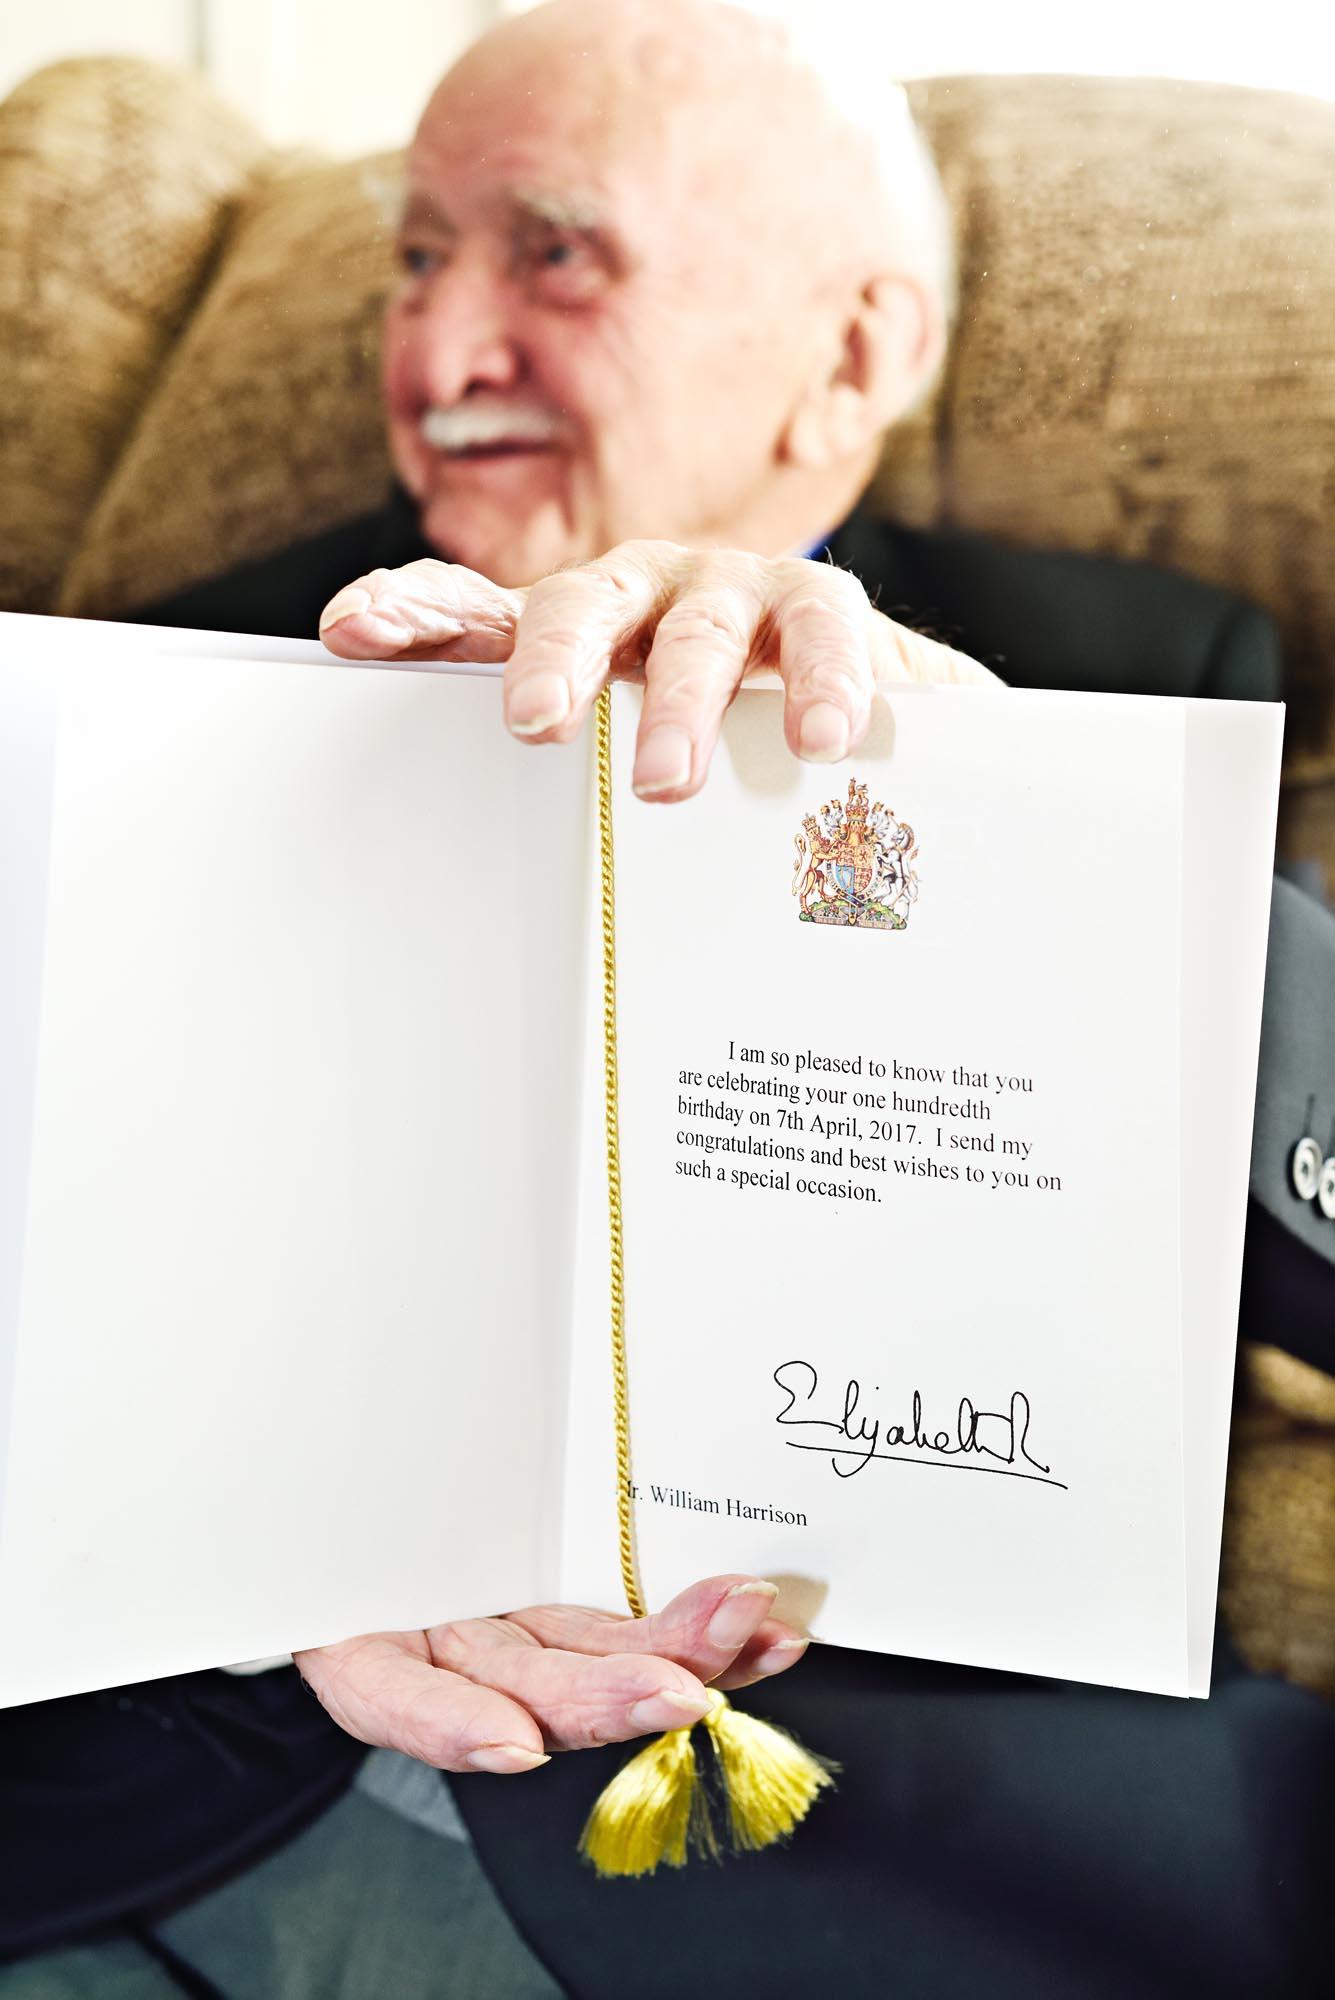 Bill Harrisons's centenary telegram from HM The Queen.